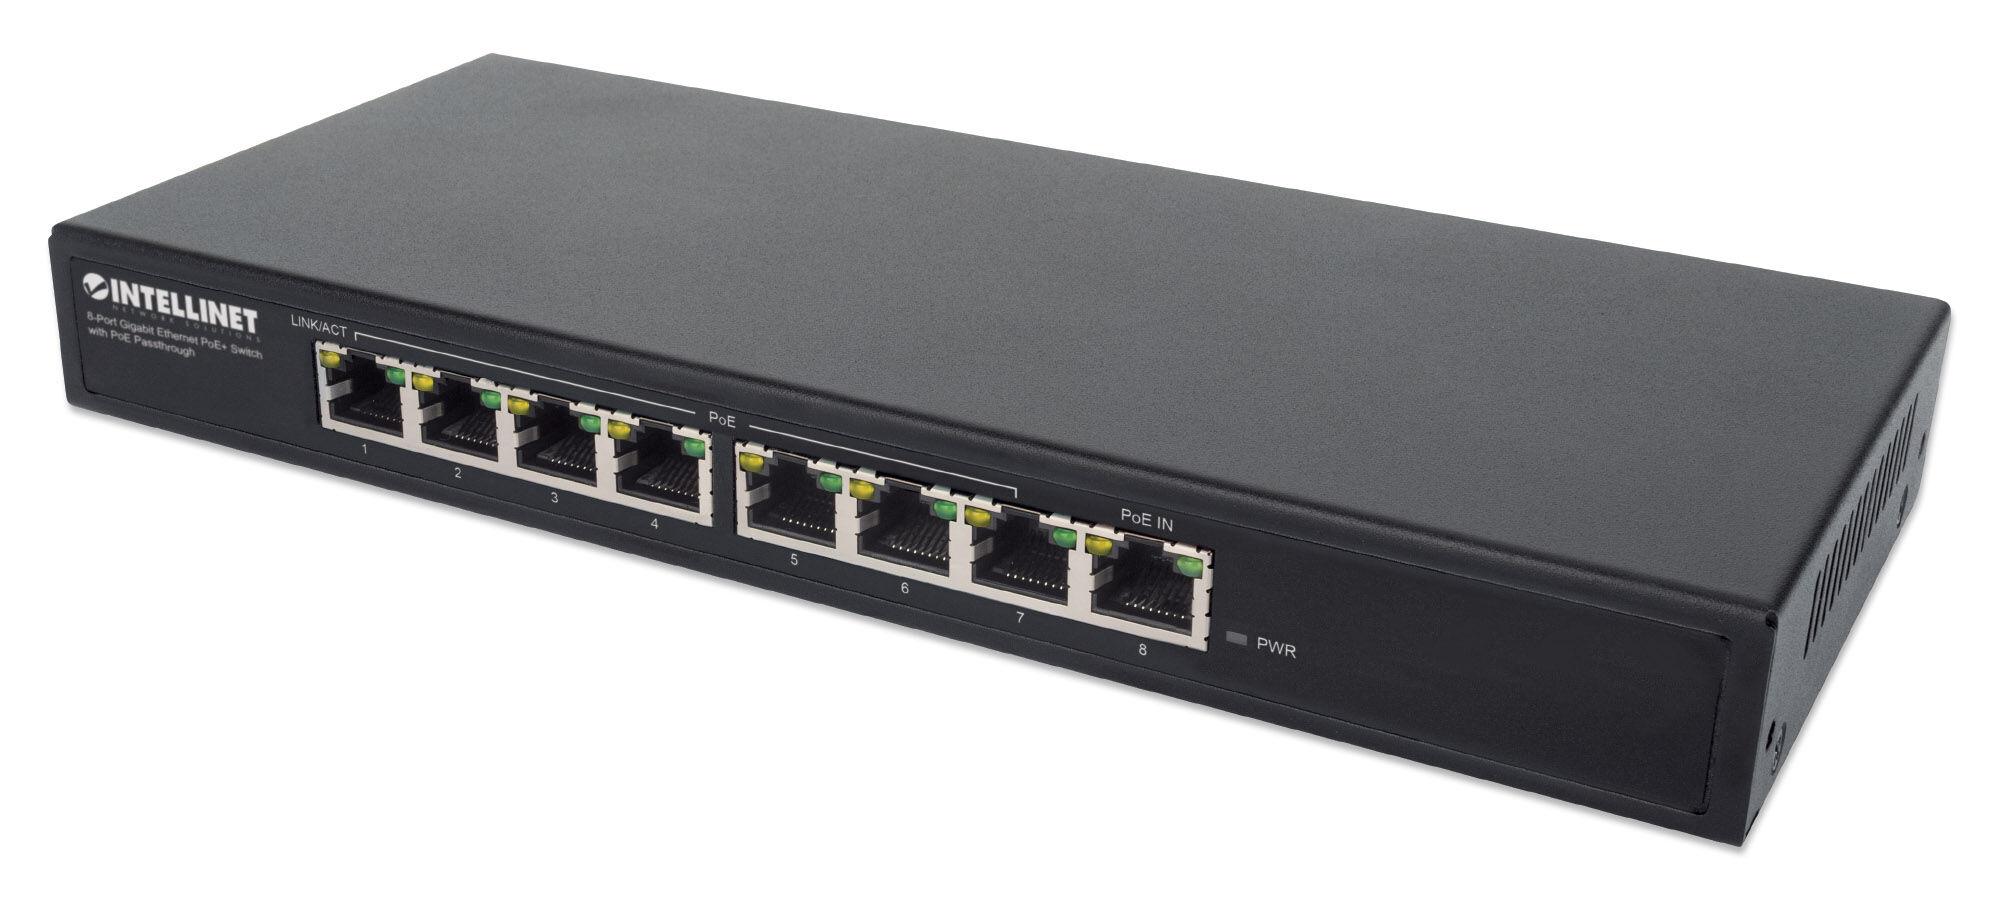 intellinet switch poe+ gigabit ethernet a 8 porte con passthrough poe